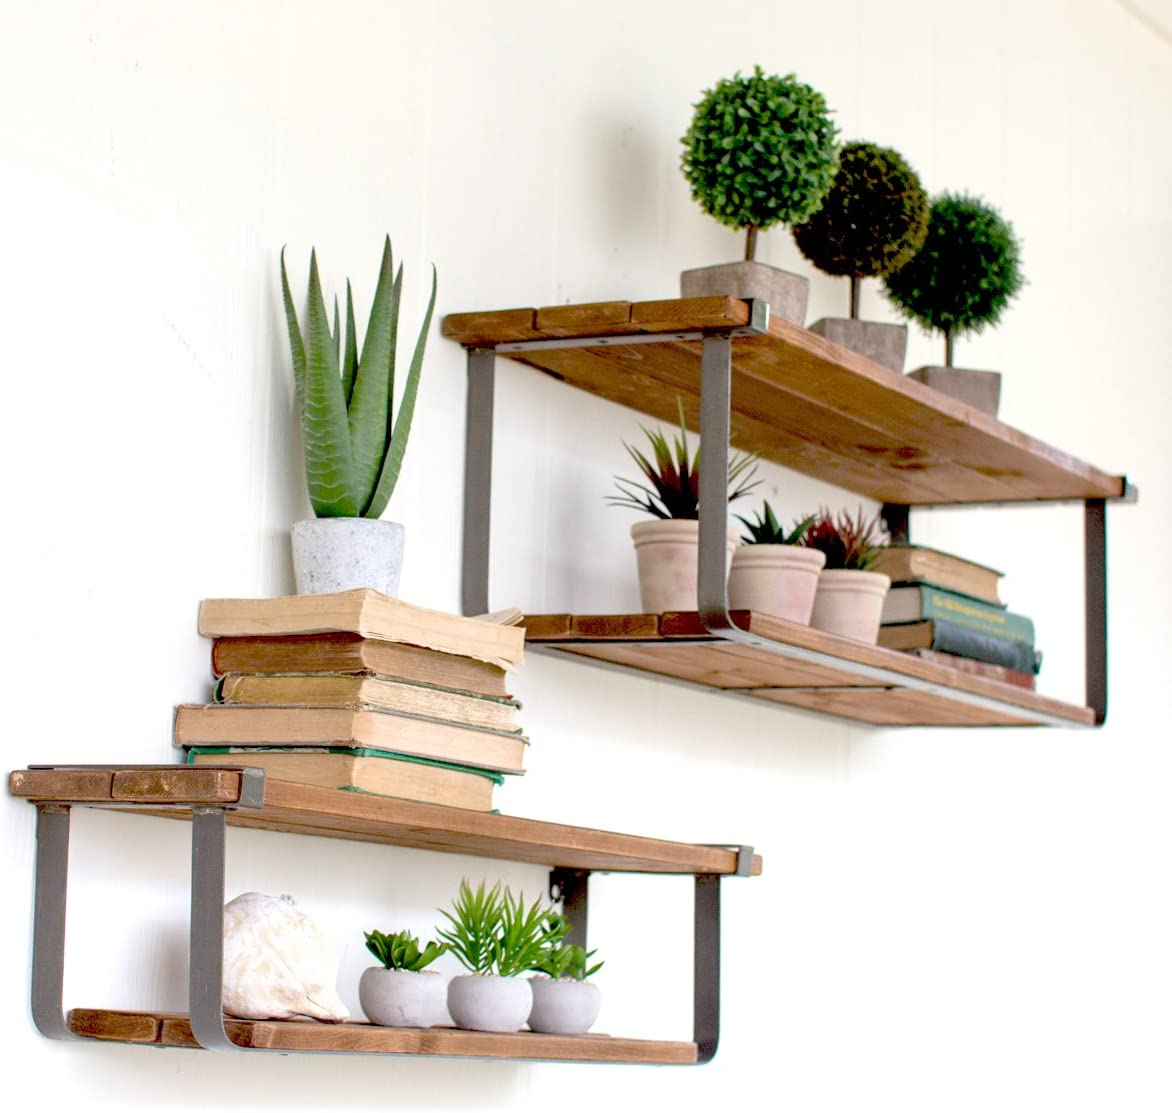 Kalalou Set of Double Recycled Wood and Metal Shelves